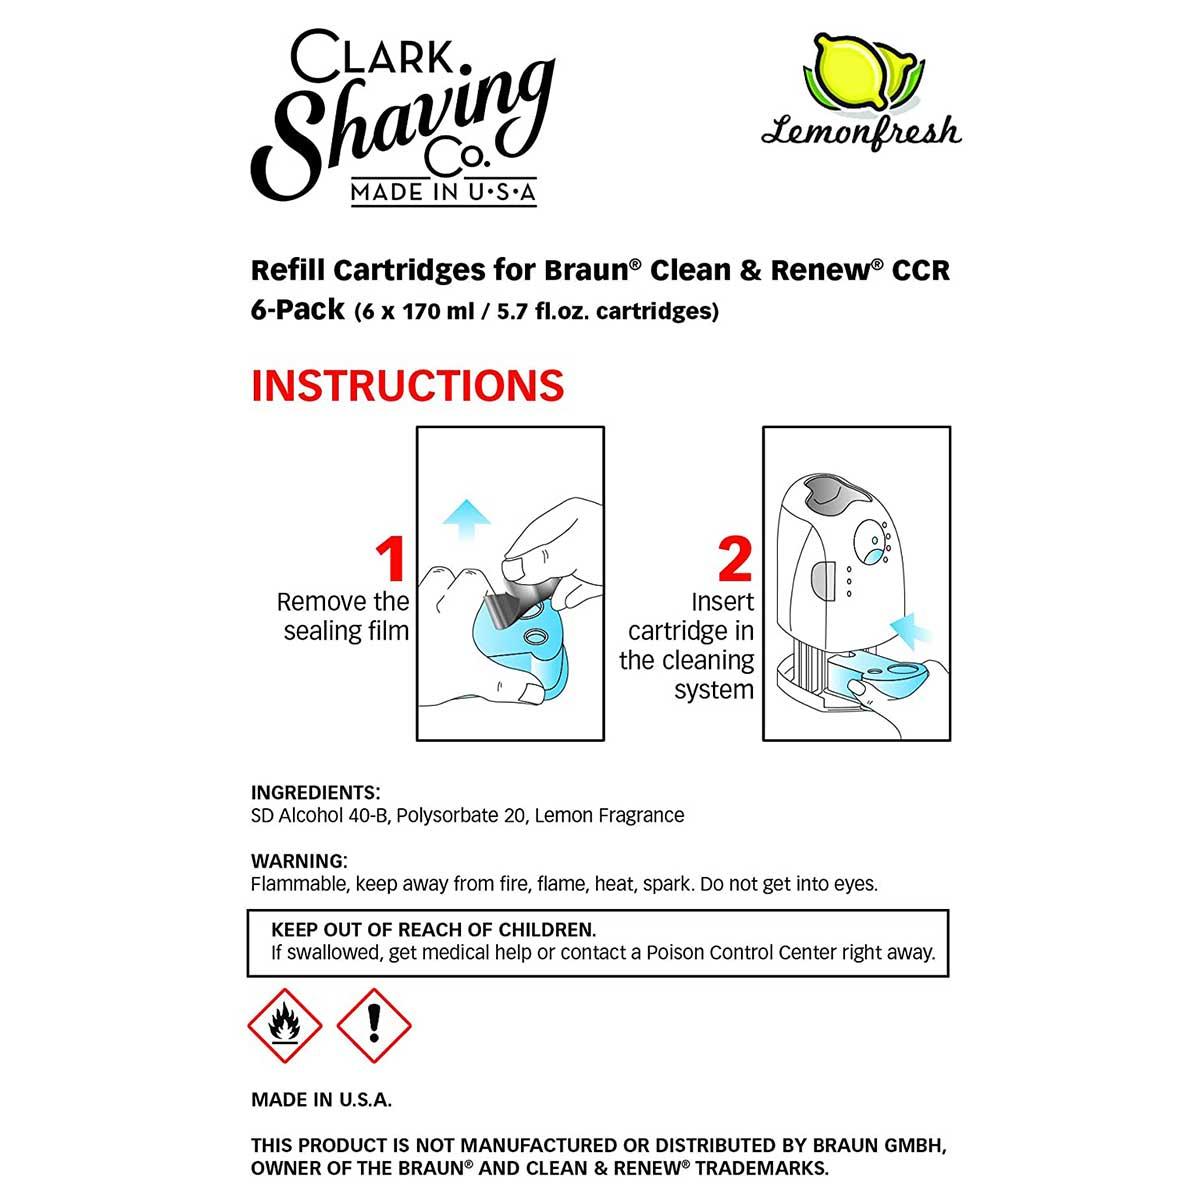 Clark Shaving Co. Refill Cartridges for Braun Clean & Renew CCR, 6-Pack